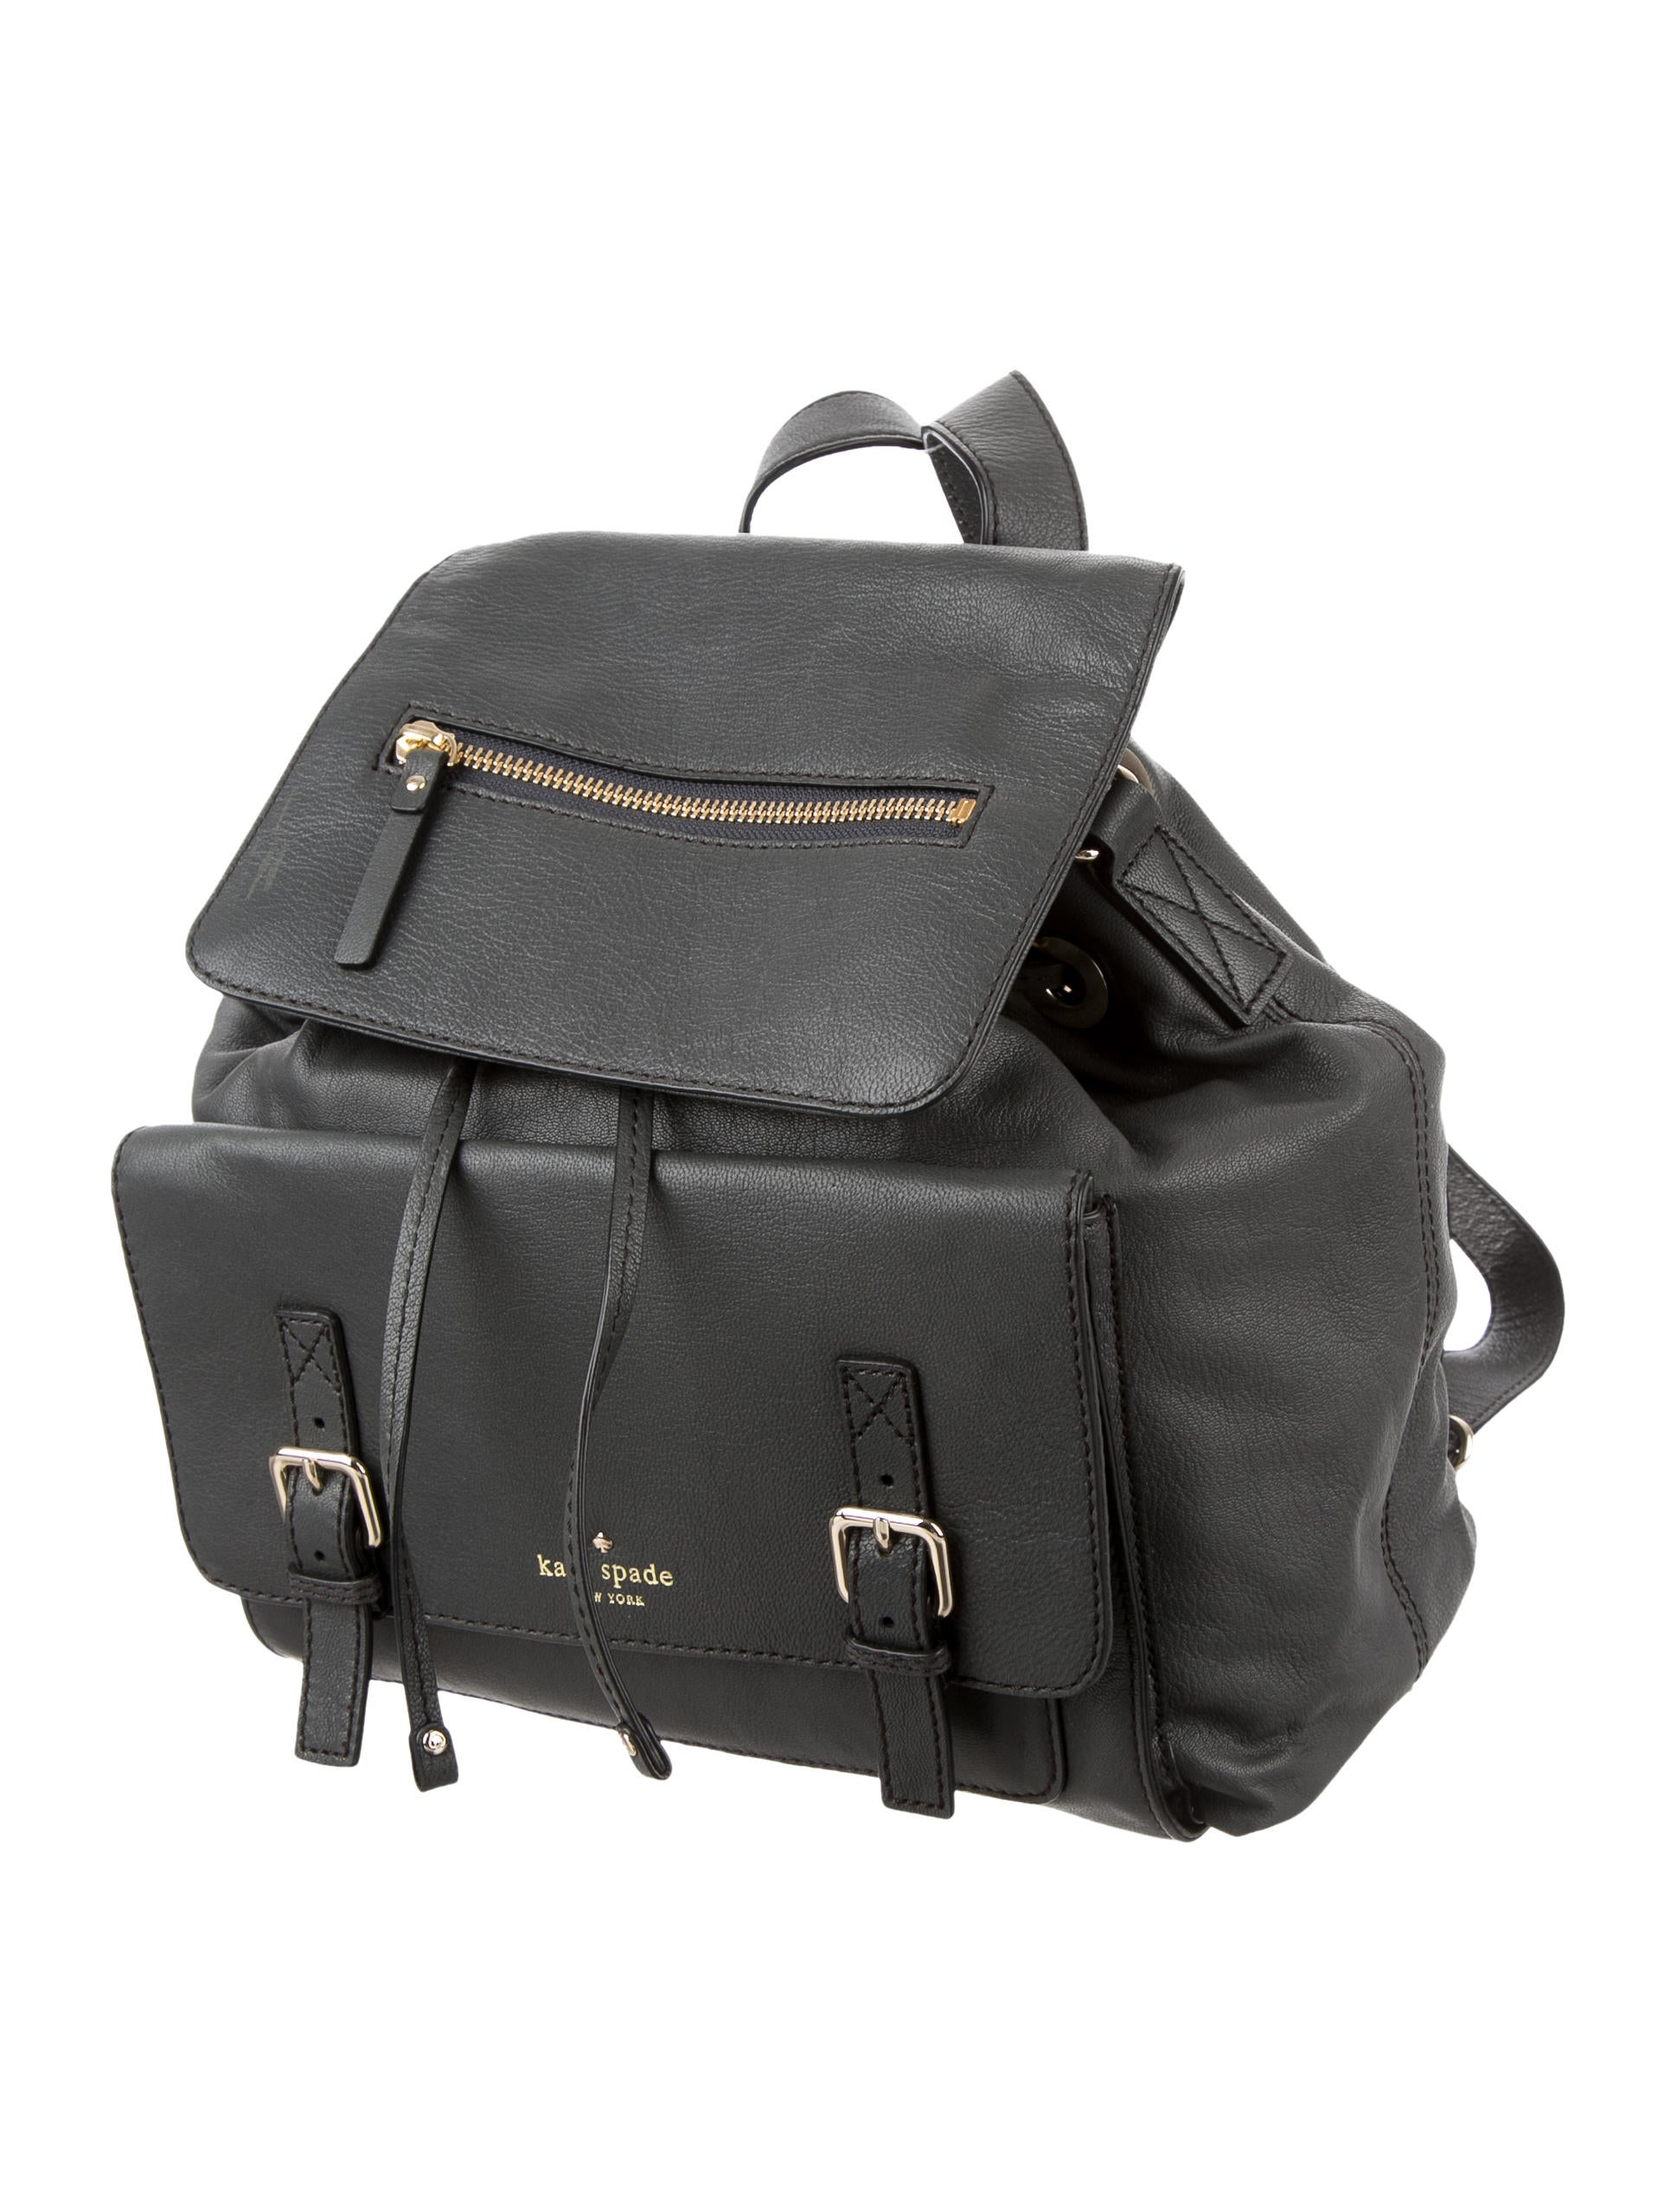 Kate Spade New York Leather Backpack - Handbags - WKA53767 ...